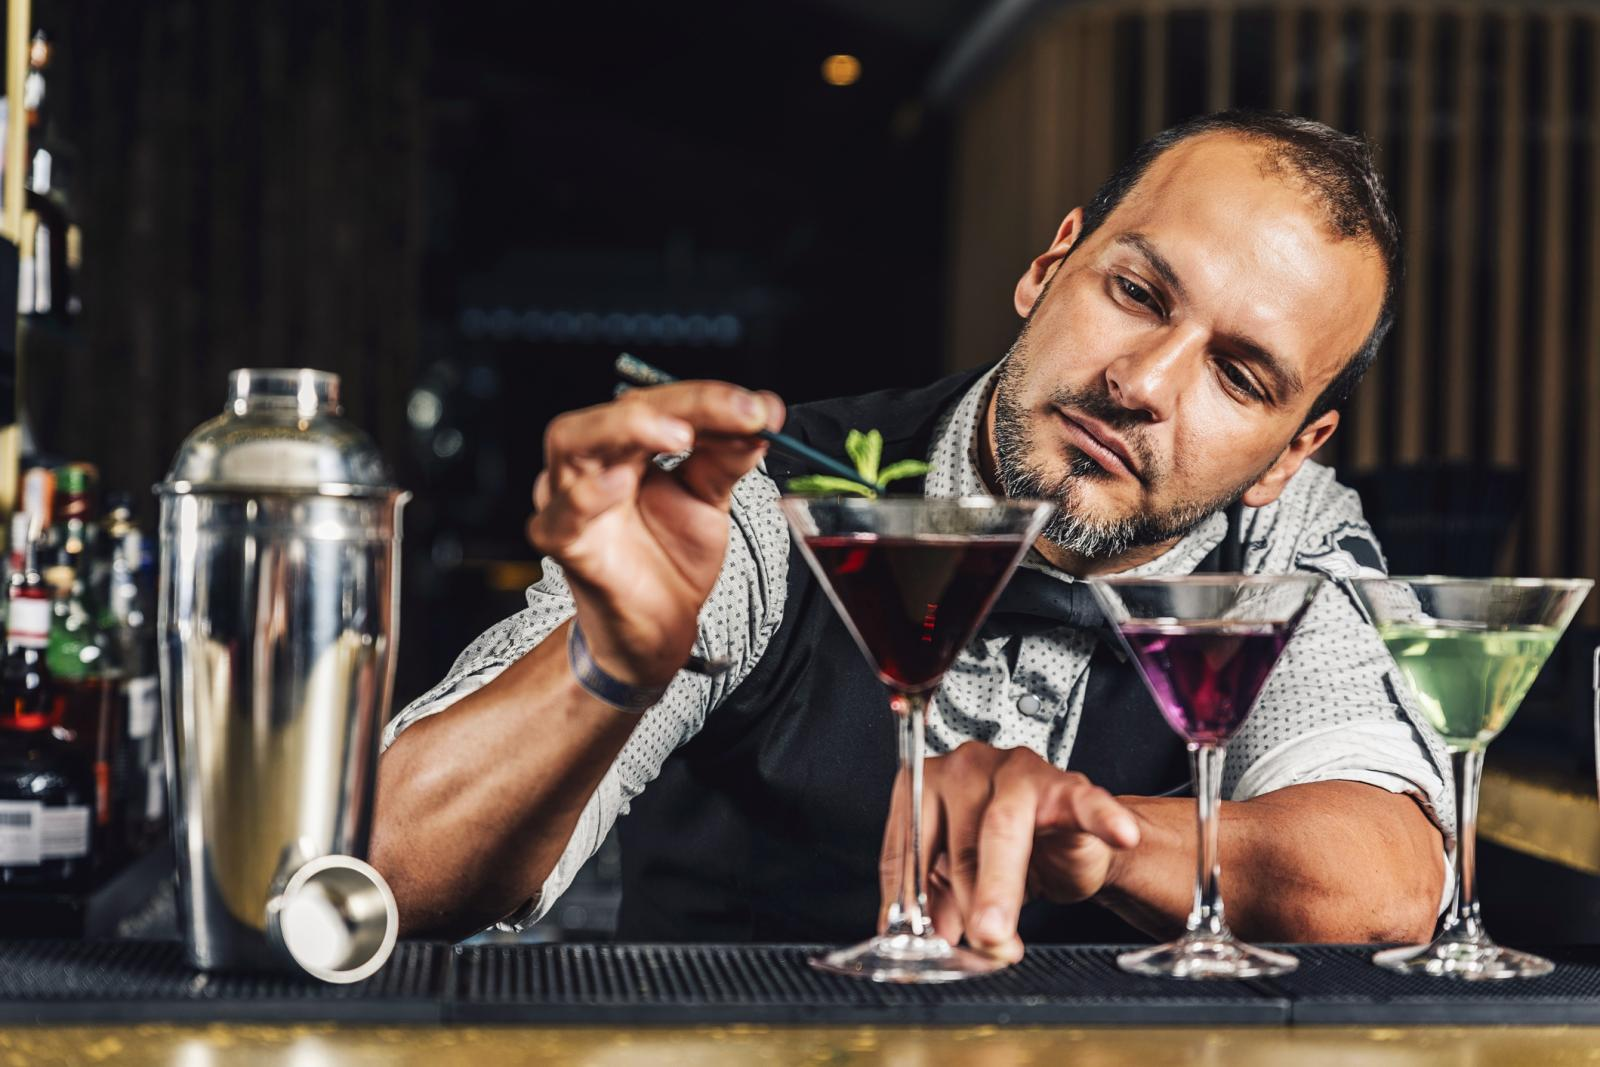 Bartender Garnishing Drink On Counter In Bar